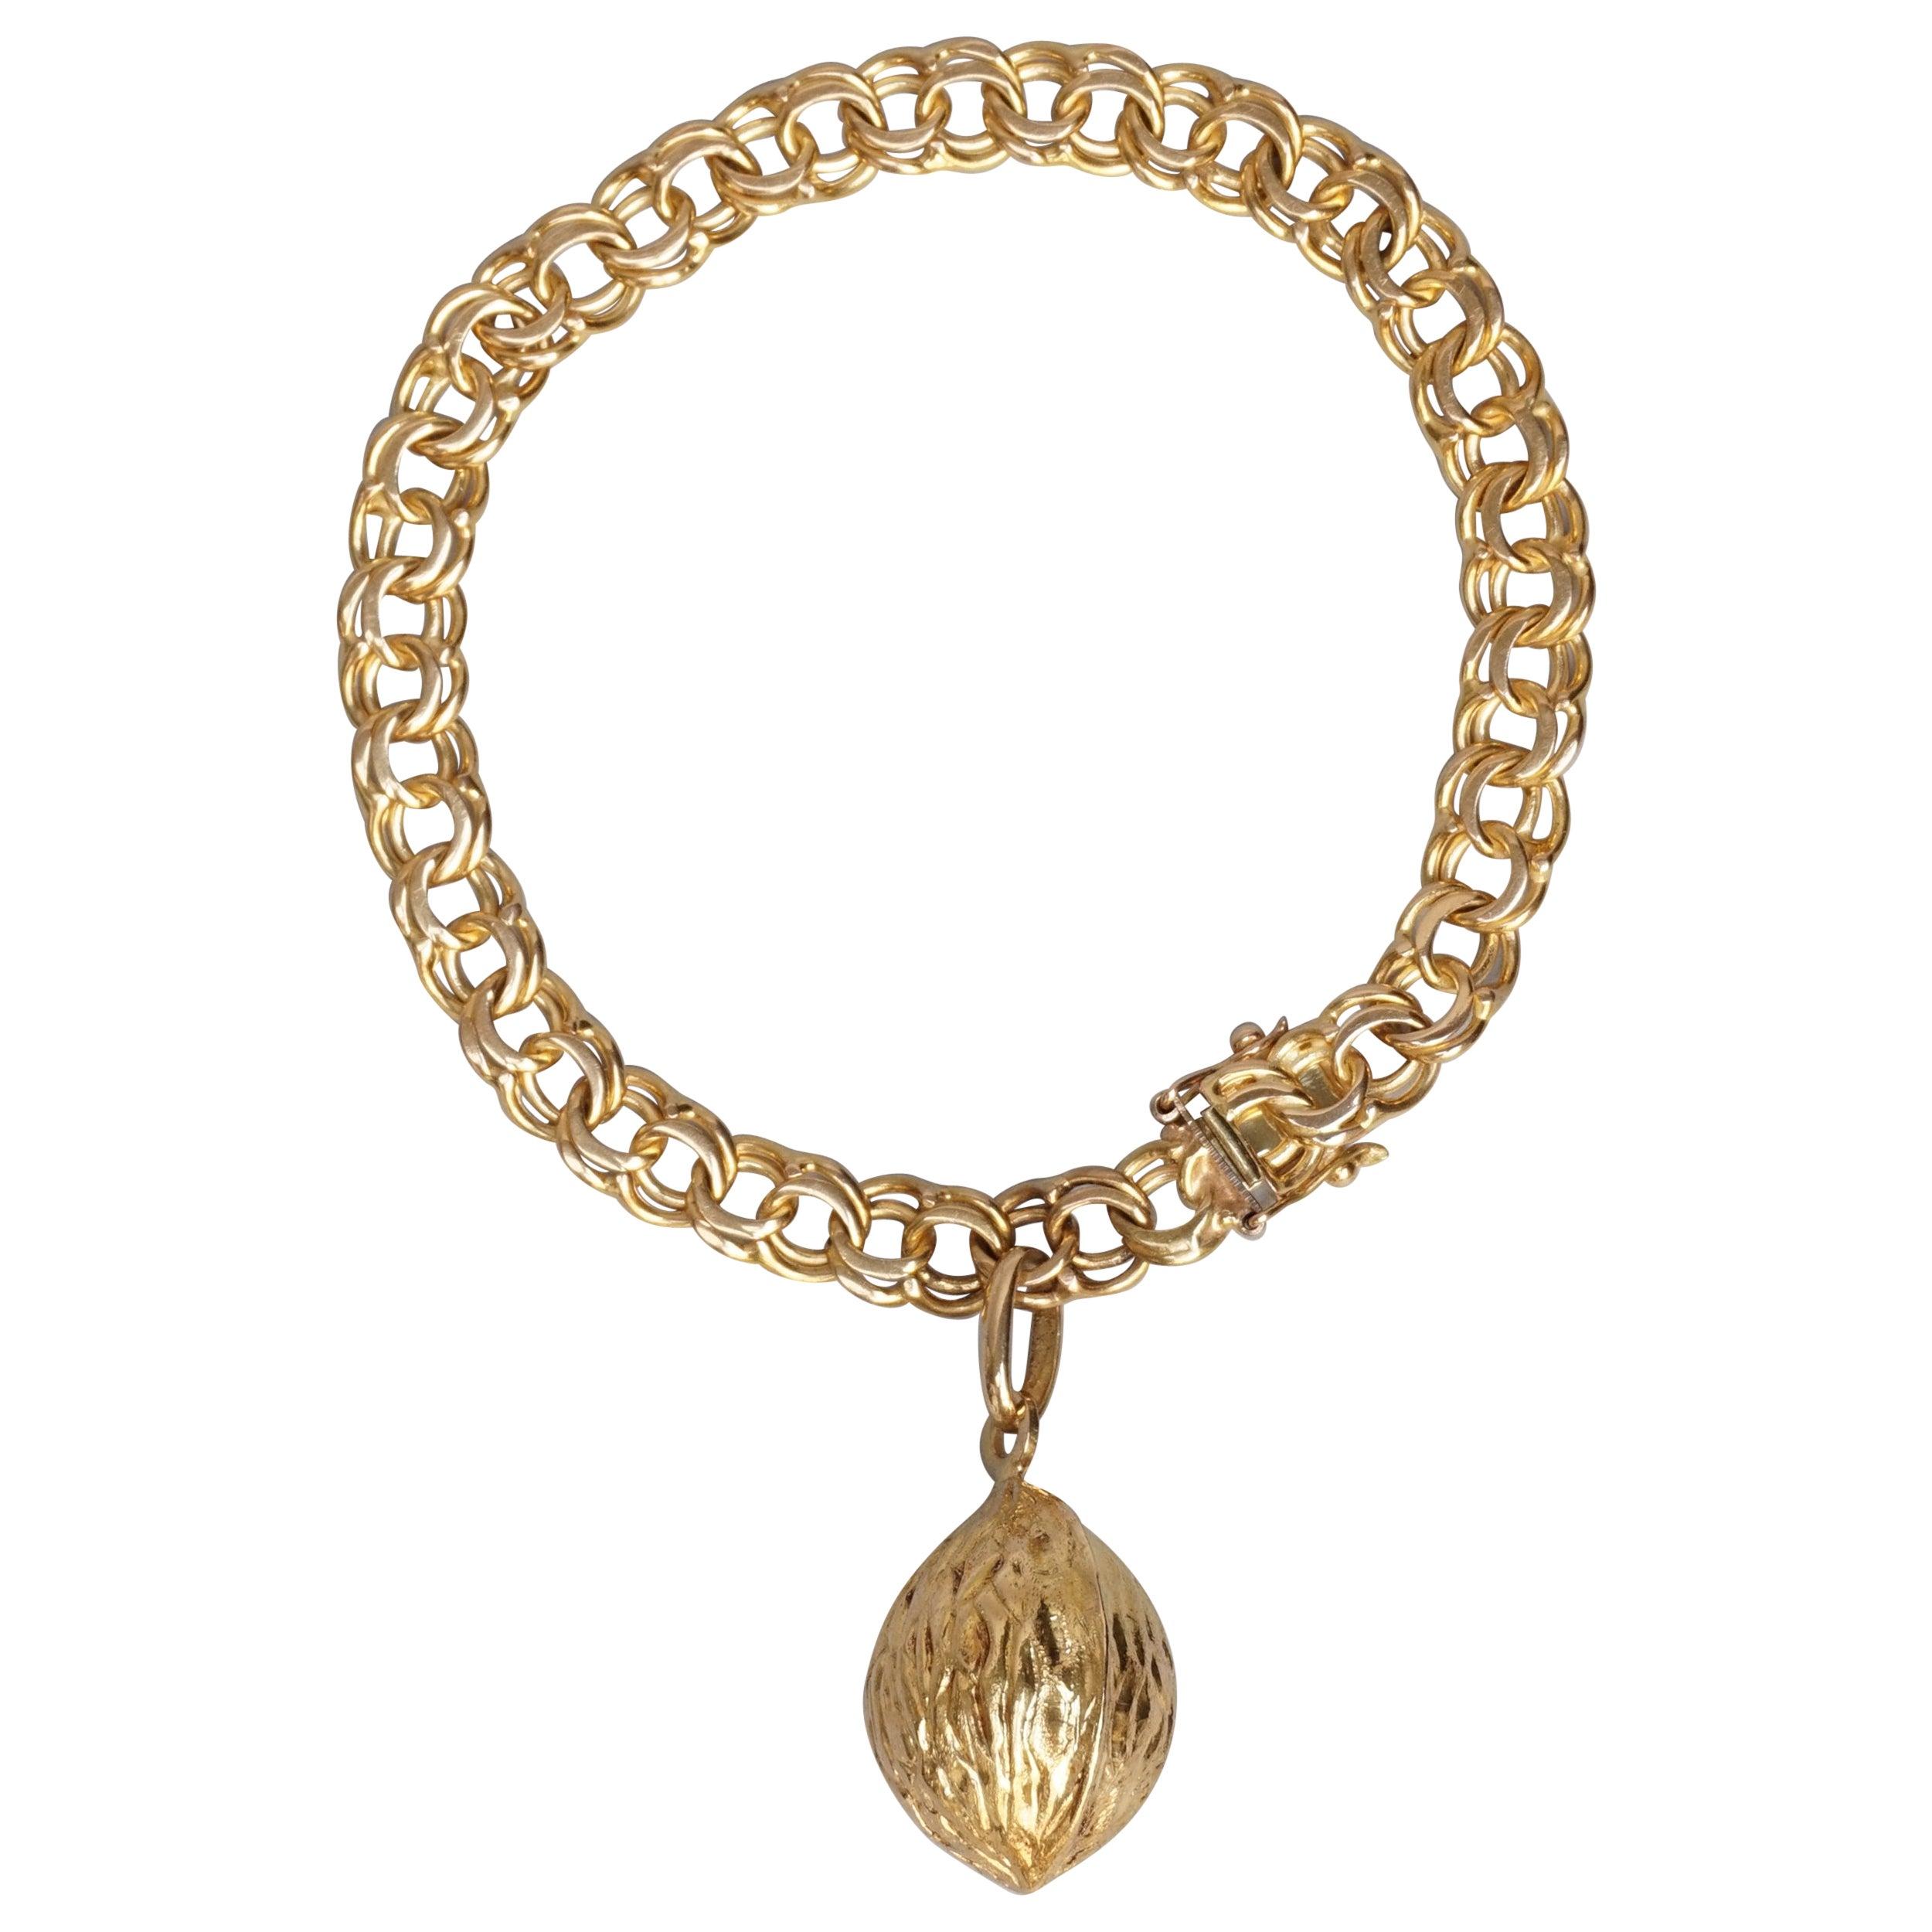 389f51e7ab5e6 1950s Classic Double Link 18-Karat Gold Charm Bracelet with Nutmeg Charm